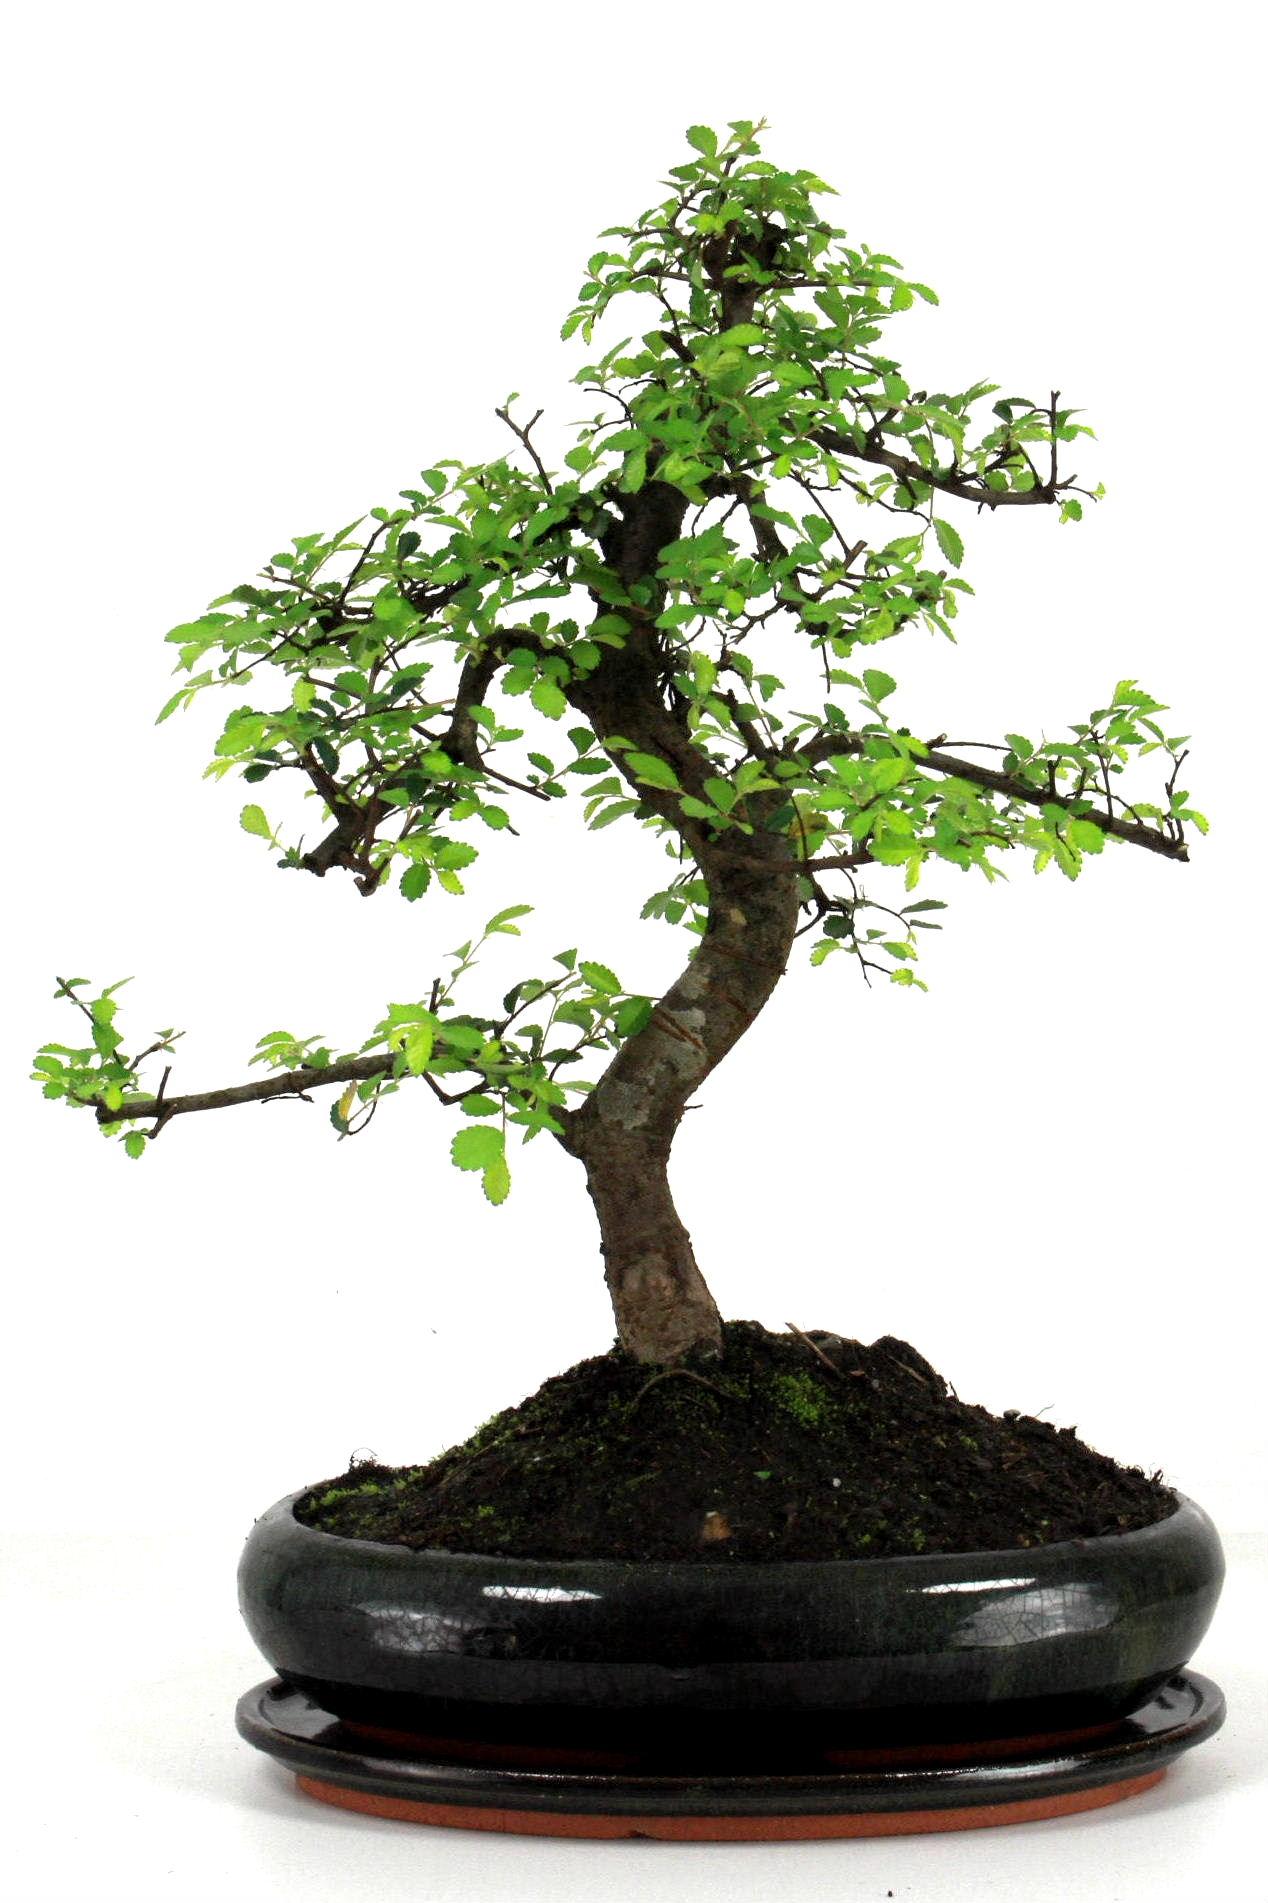 chinesische ulme bonsai 40 cm 252 bei oyaki bonsai kaufen. Black Bedroom Furniture Sets. Home Design Ideas